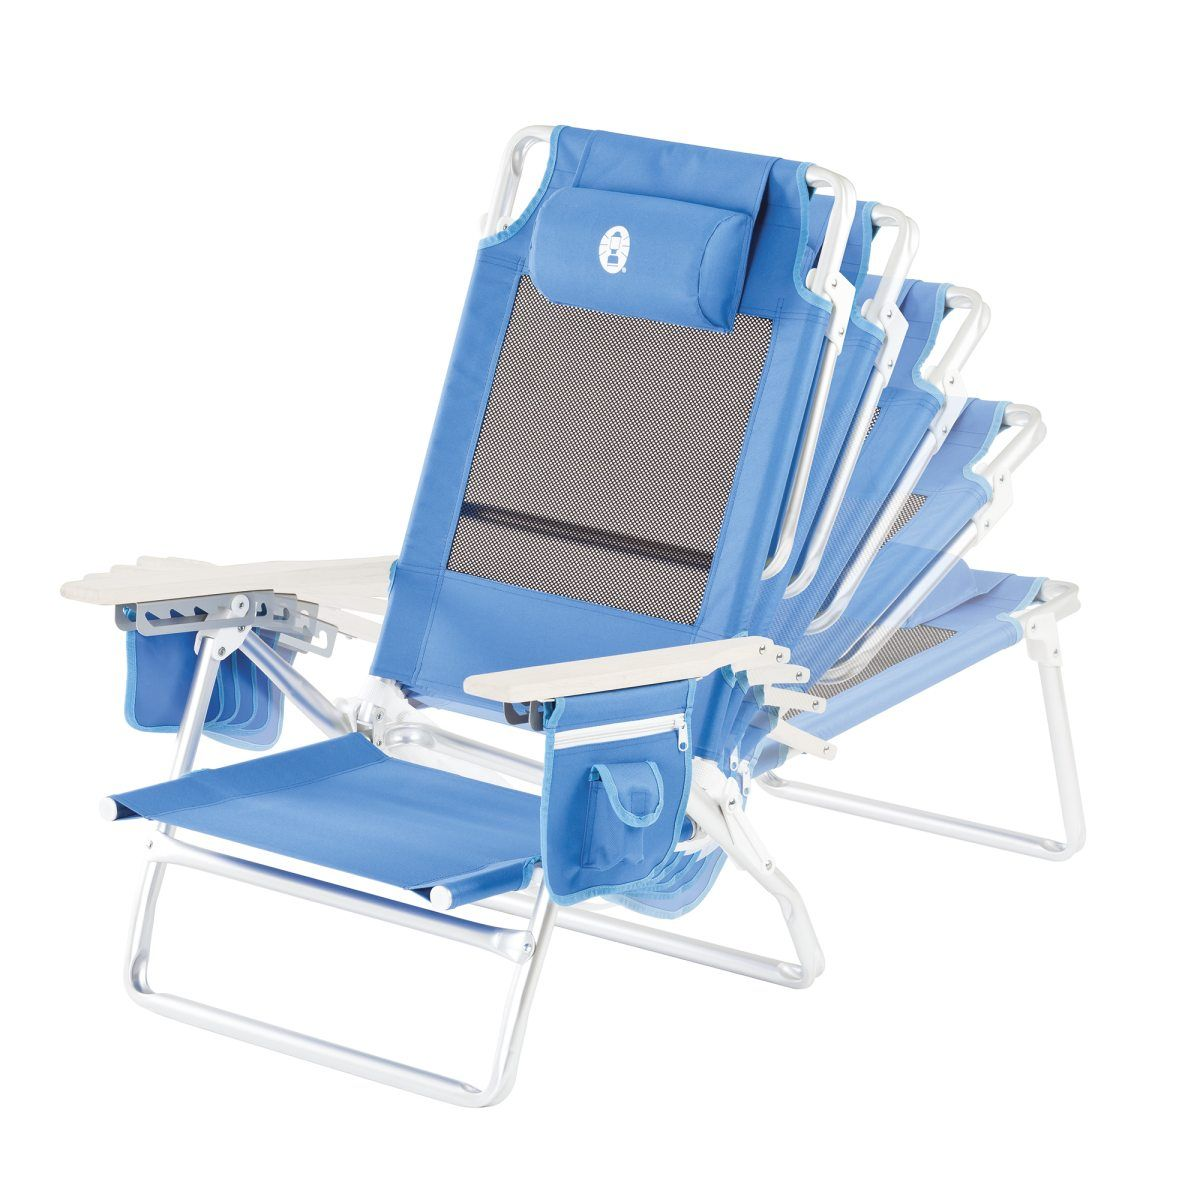 Xxl Desk Chair Plastic Chairs Cheap Coleman Low Recliner Beach Solstol